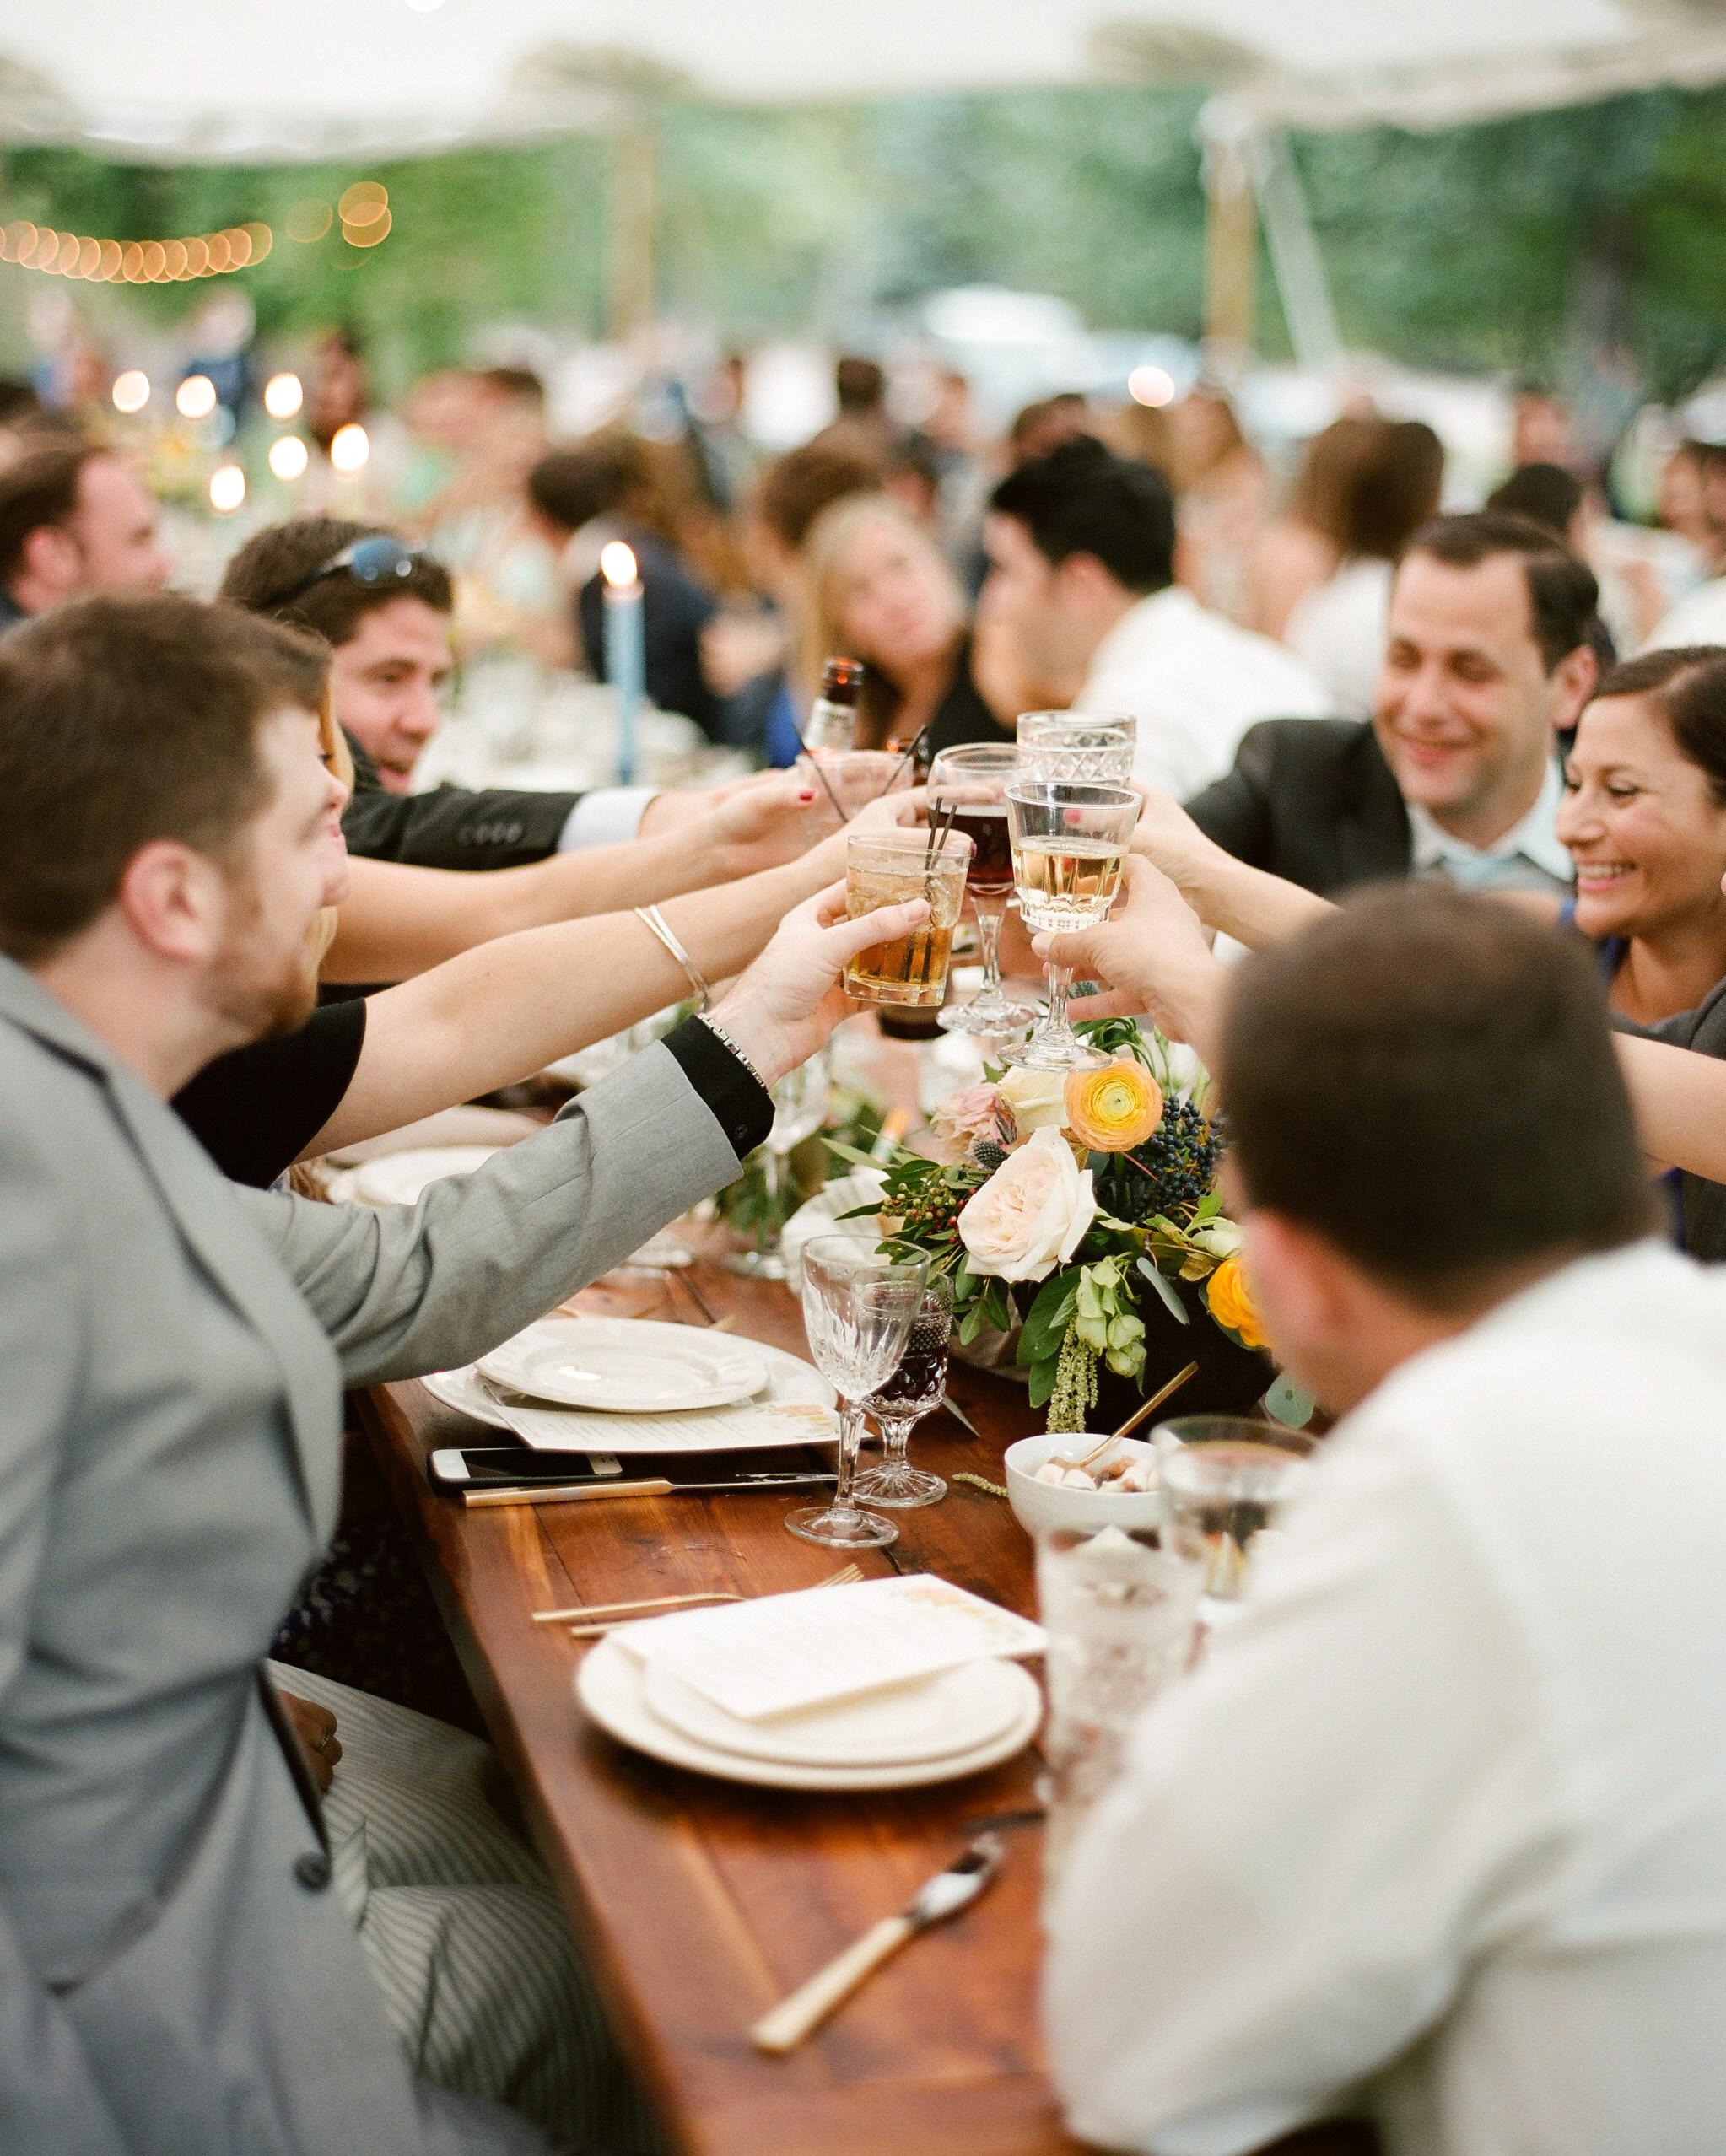 lana-danny-wedding-cheers-644-s111831-0315.jpg